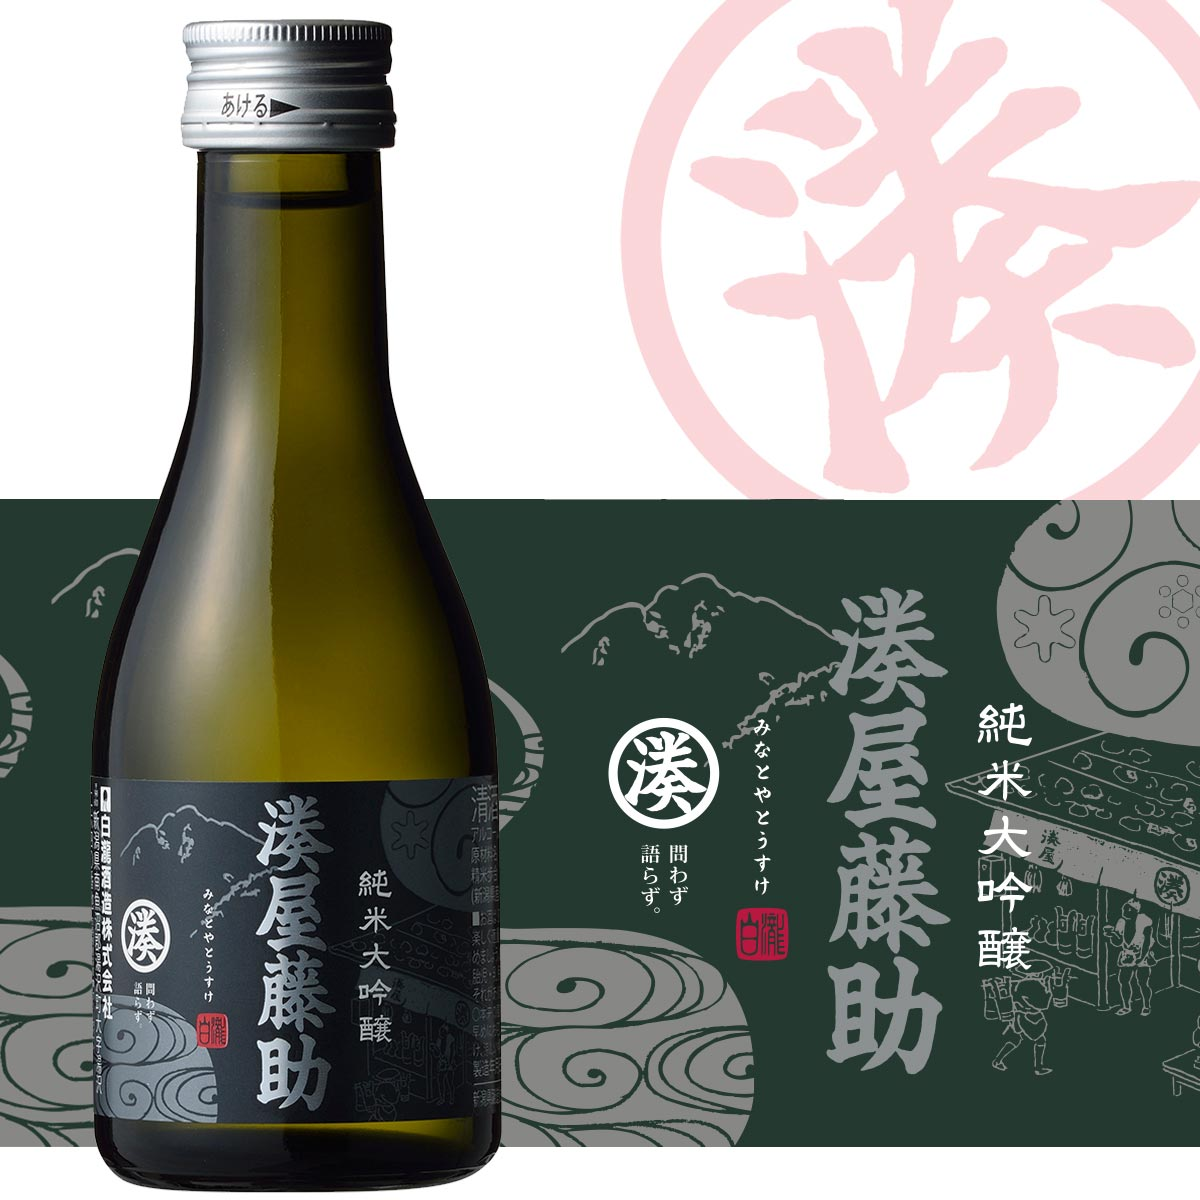 【ケース販売】 湊屋藤助 純米大吟醸 180ml×12本入り